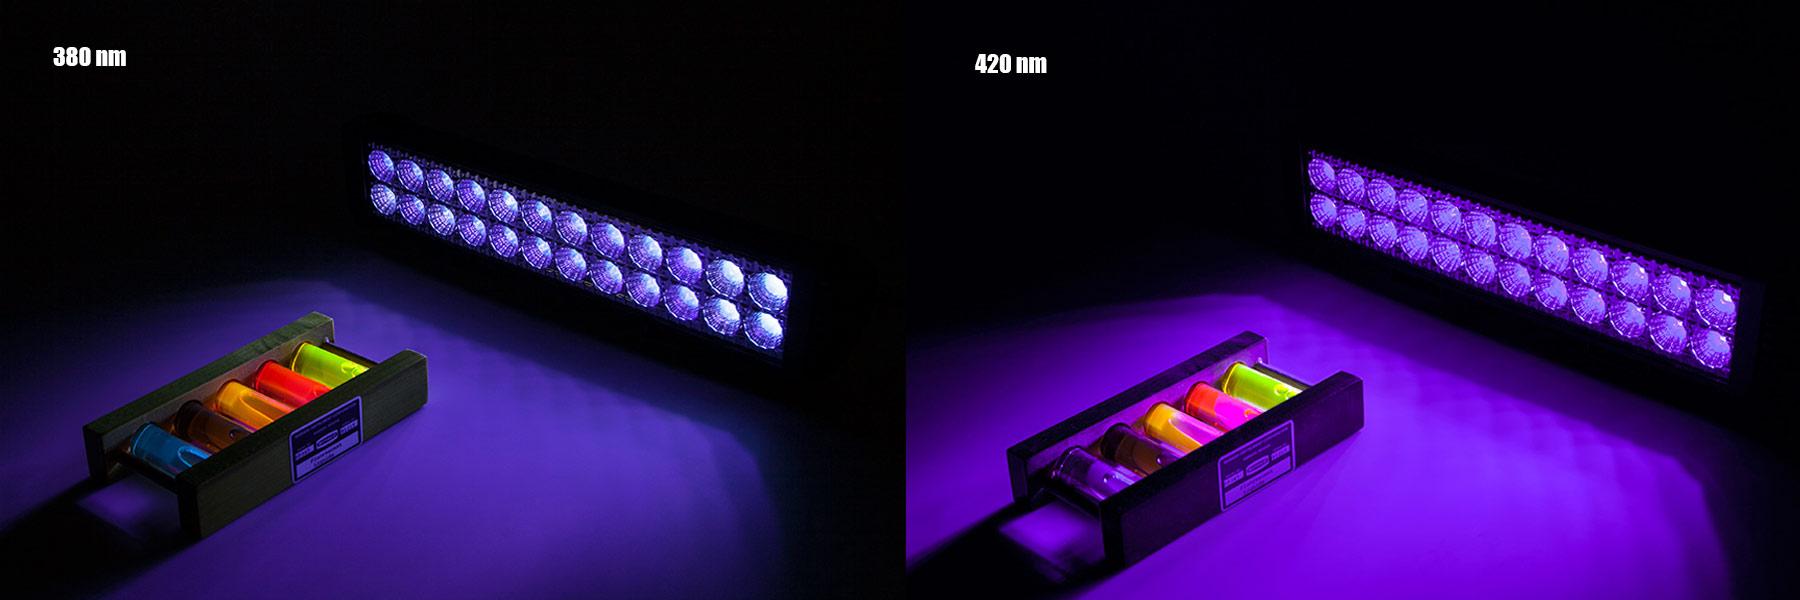 high powered uv led flood light 45w specialty high. Black Bedroom Furniture Sets. Home Design Ideas